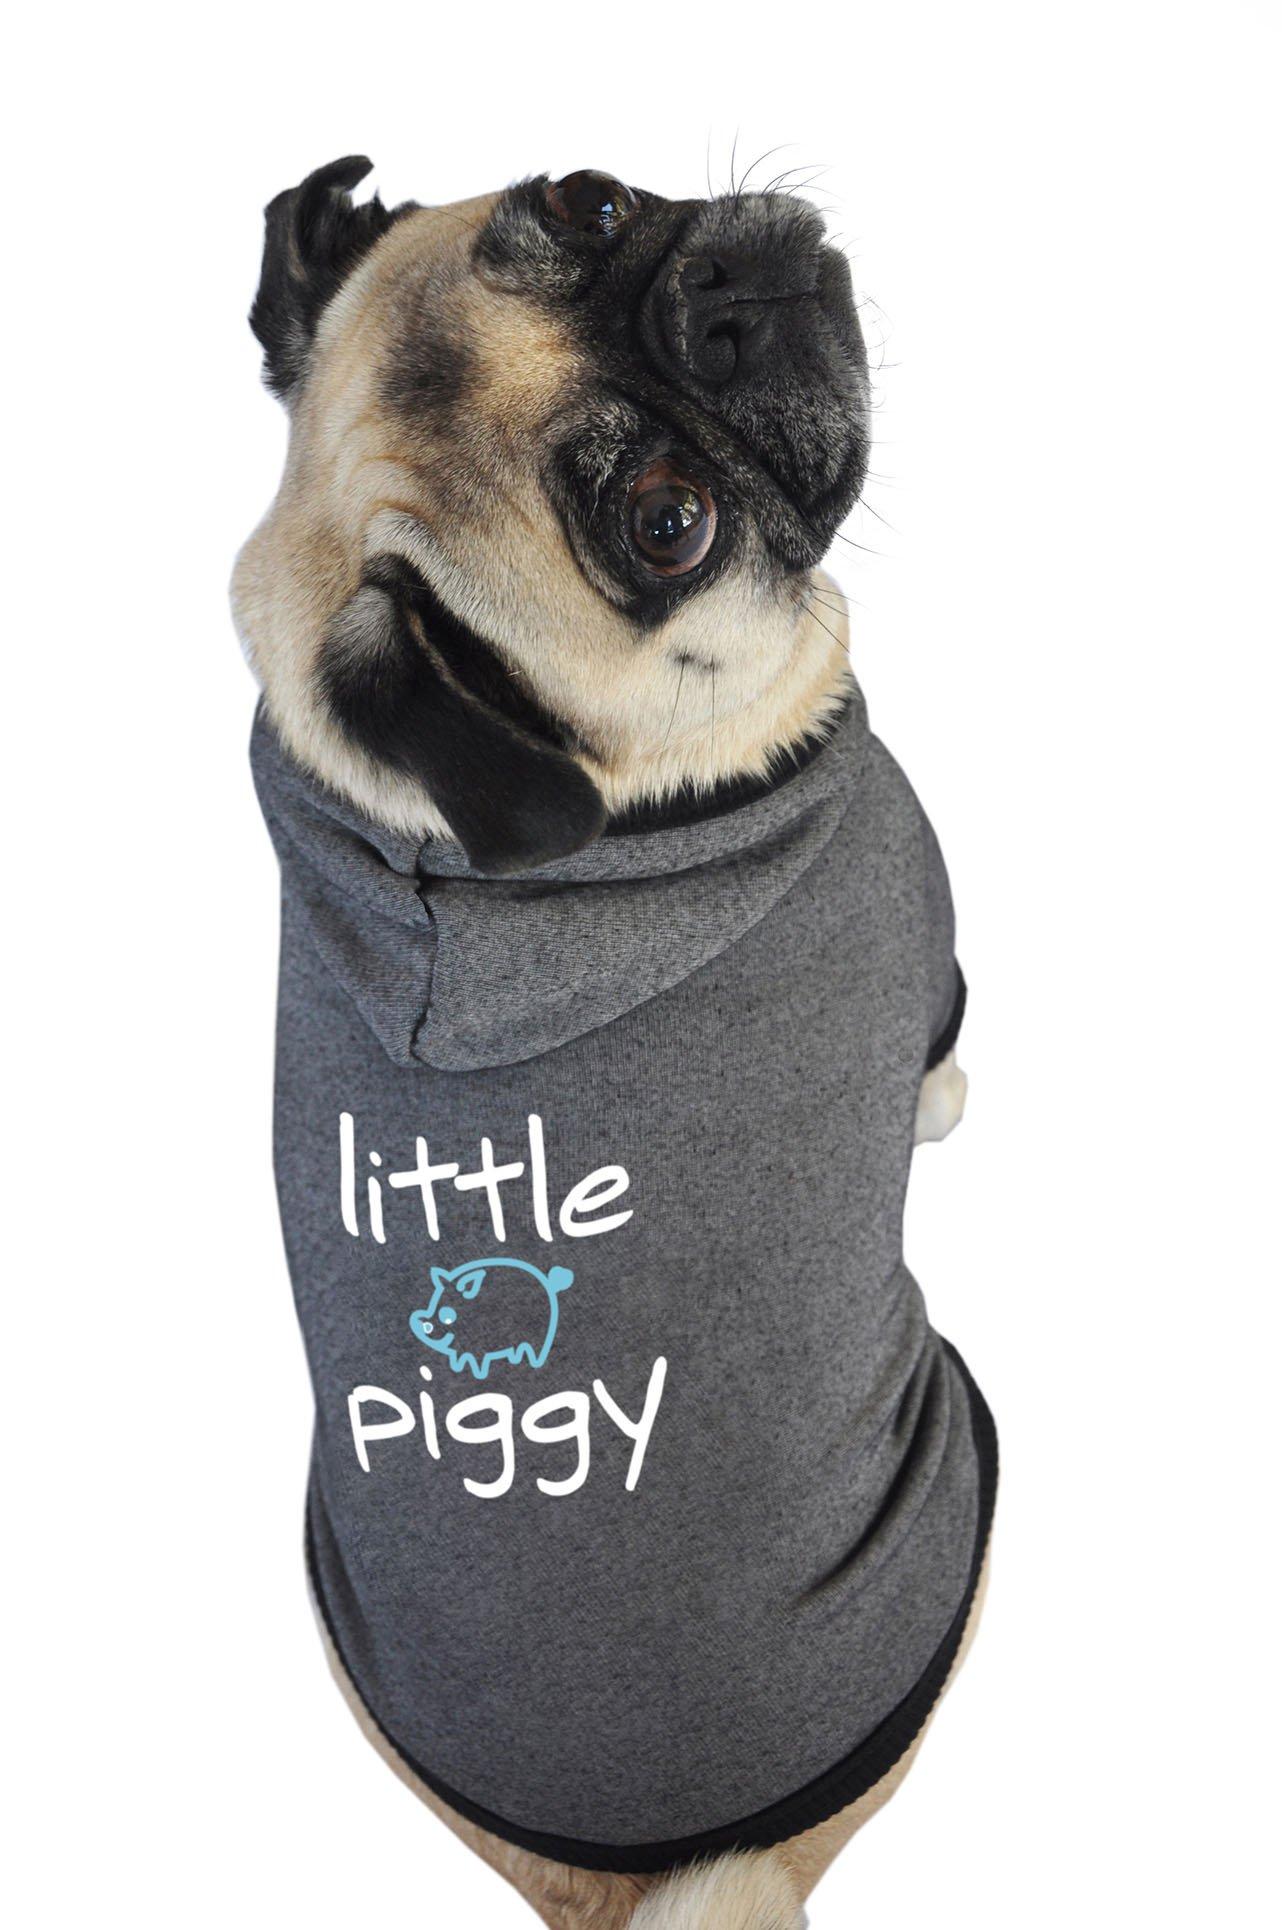 Ruff Ruff and Meow Dog Hoodie, Little Piggy, Black, Small by Ruff Ruff and Meow